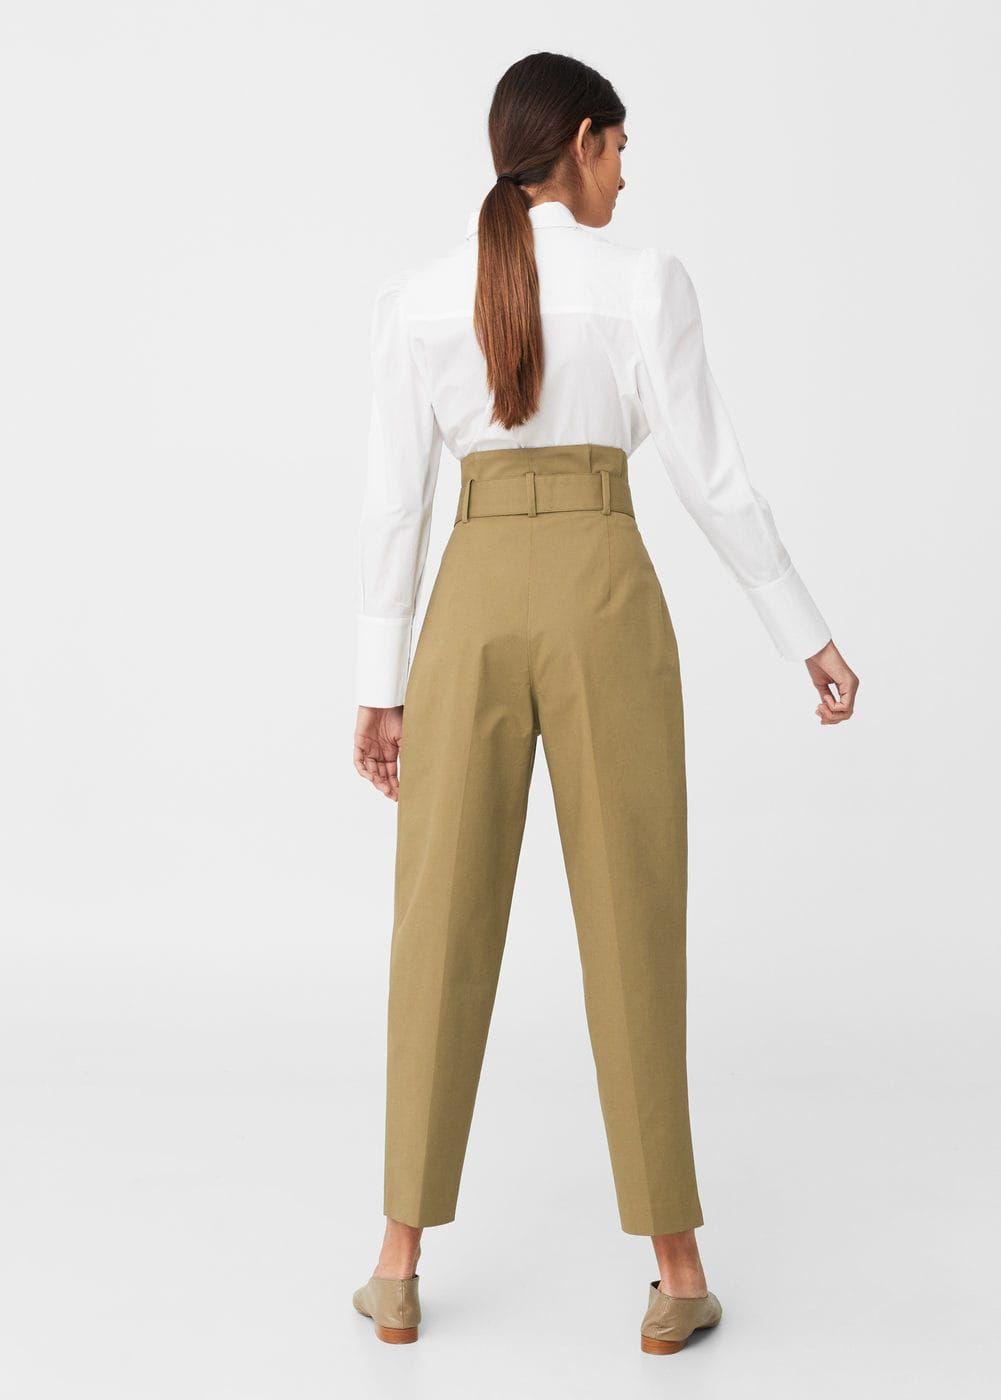 Pantalon taille haute   MANGO   Dressing S   Pinterest d642228a9e4